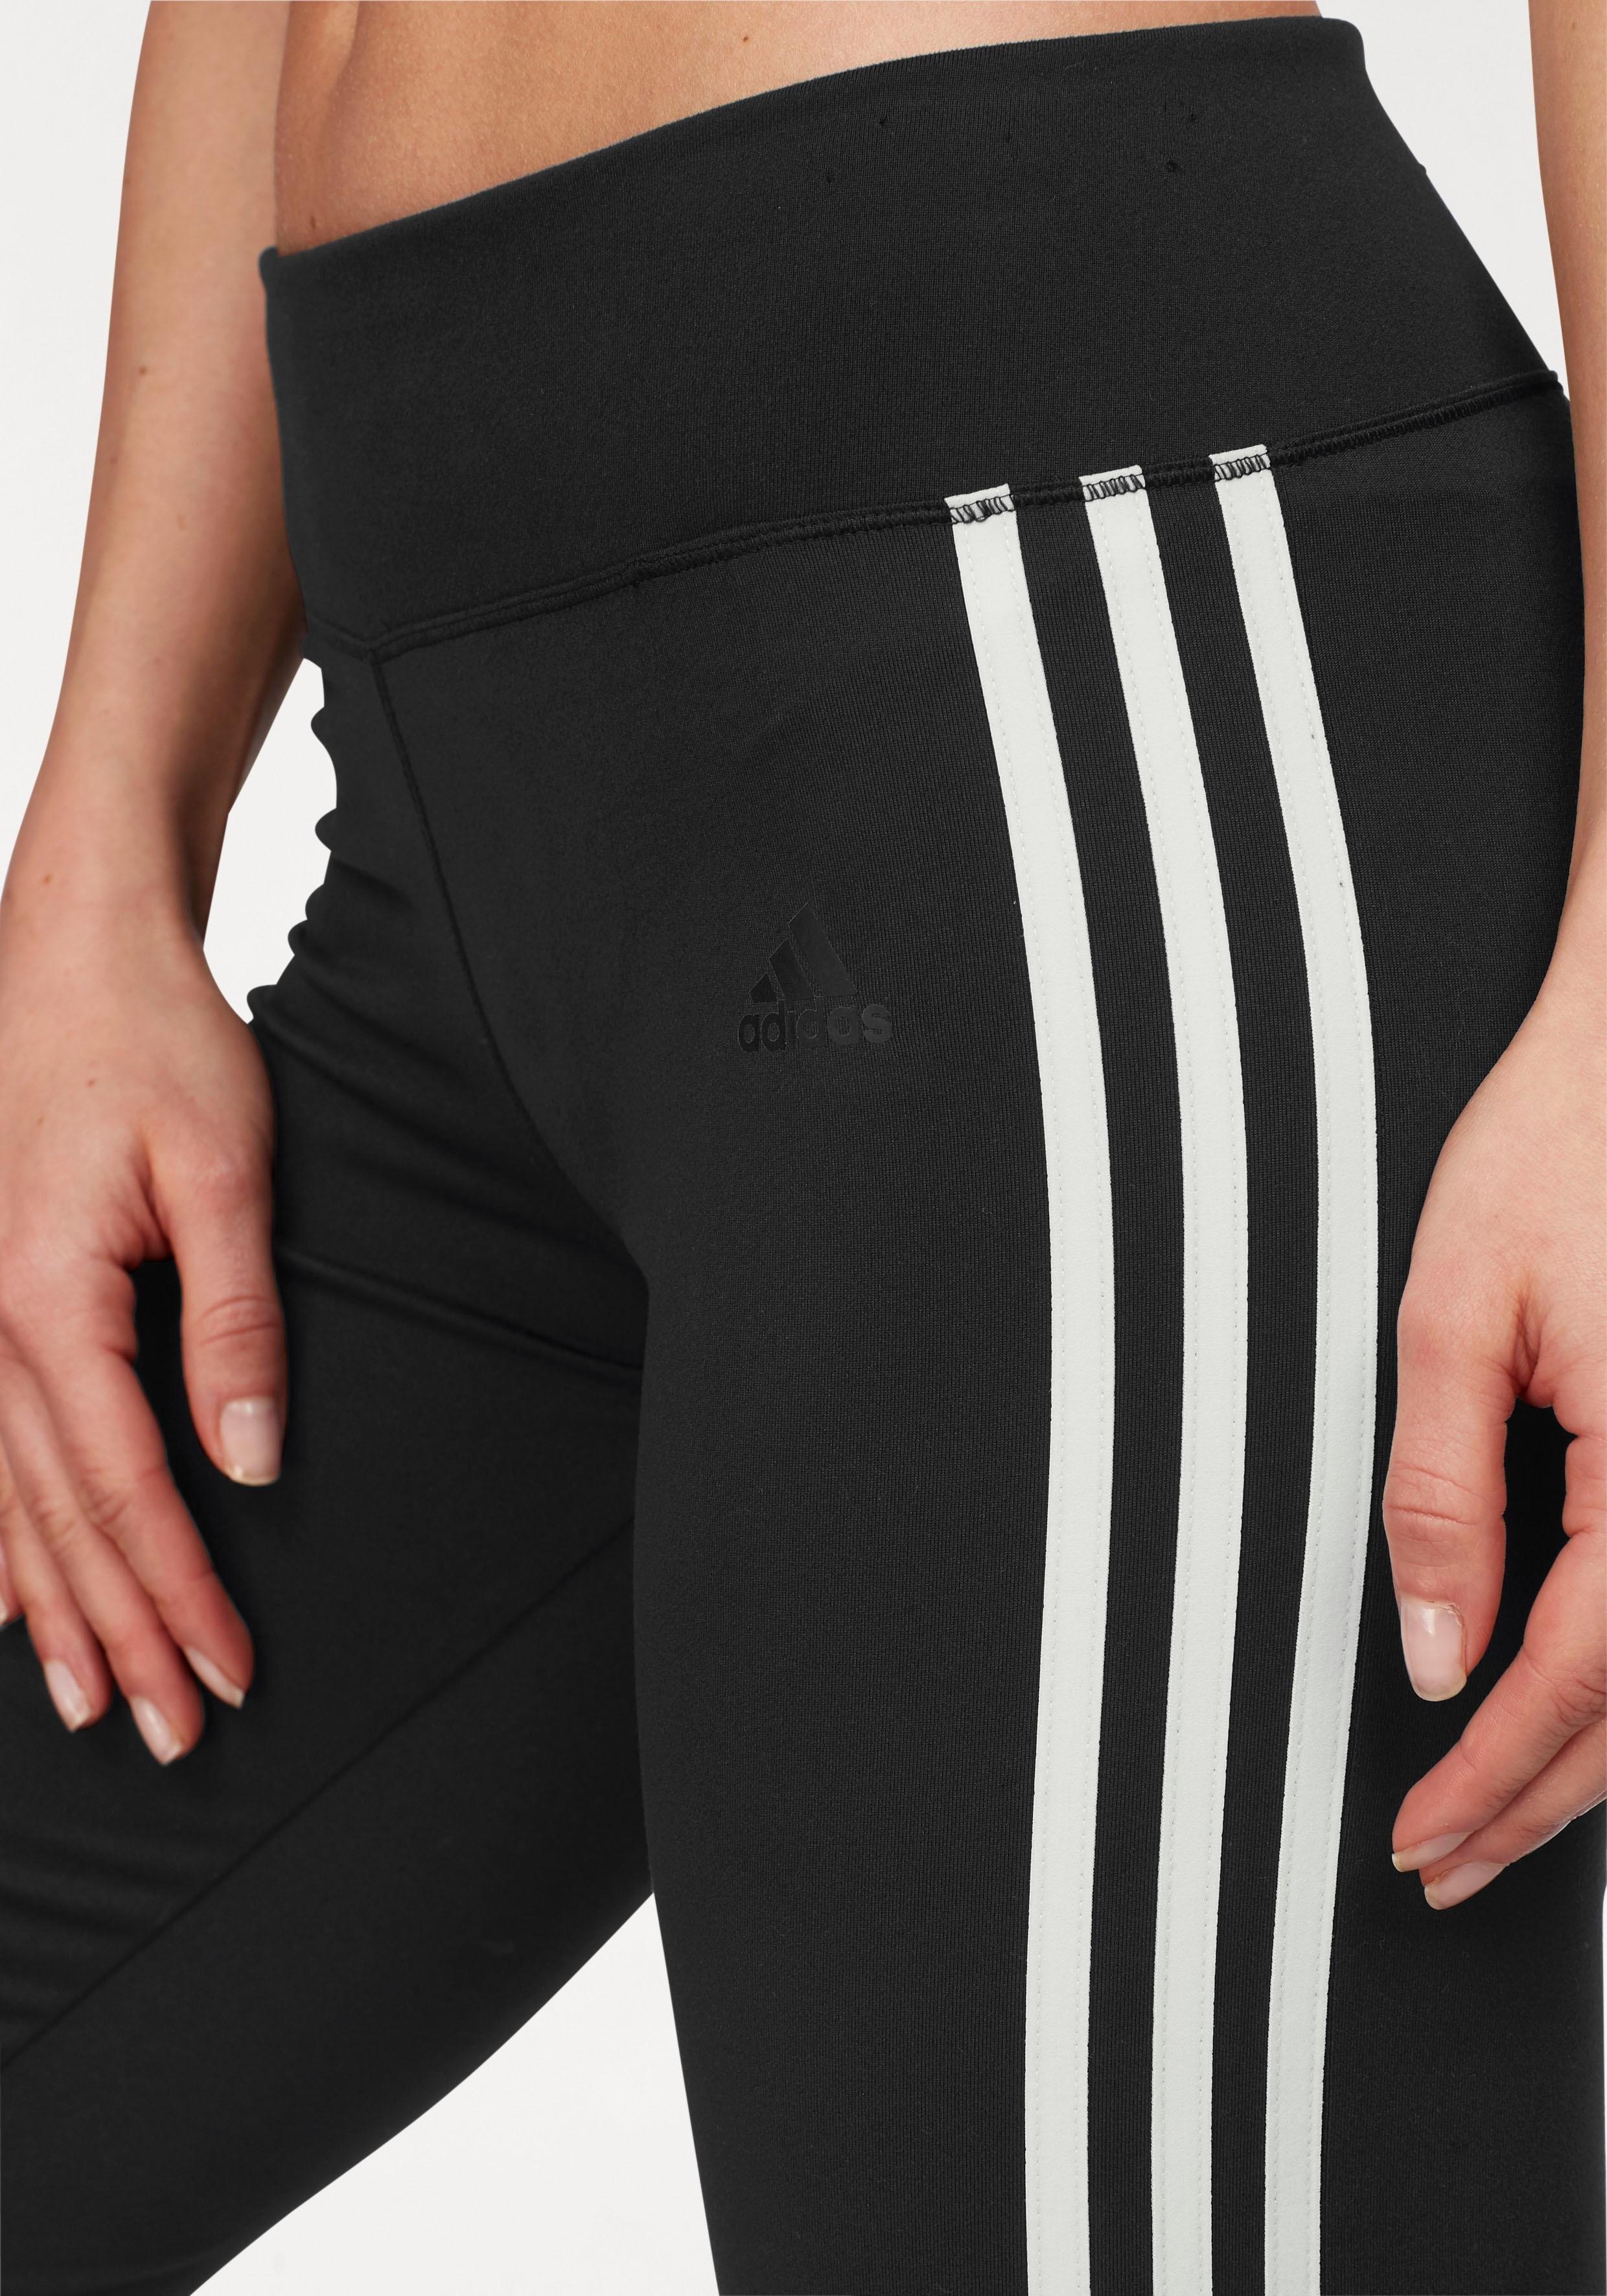 Shop Adidas Online Pant Performance Jazzpantsbrushed 3s O8nvNm0w